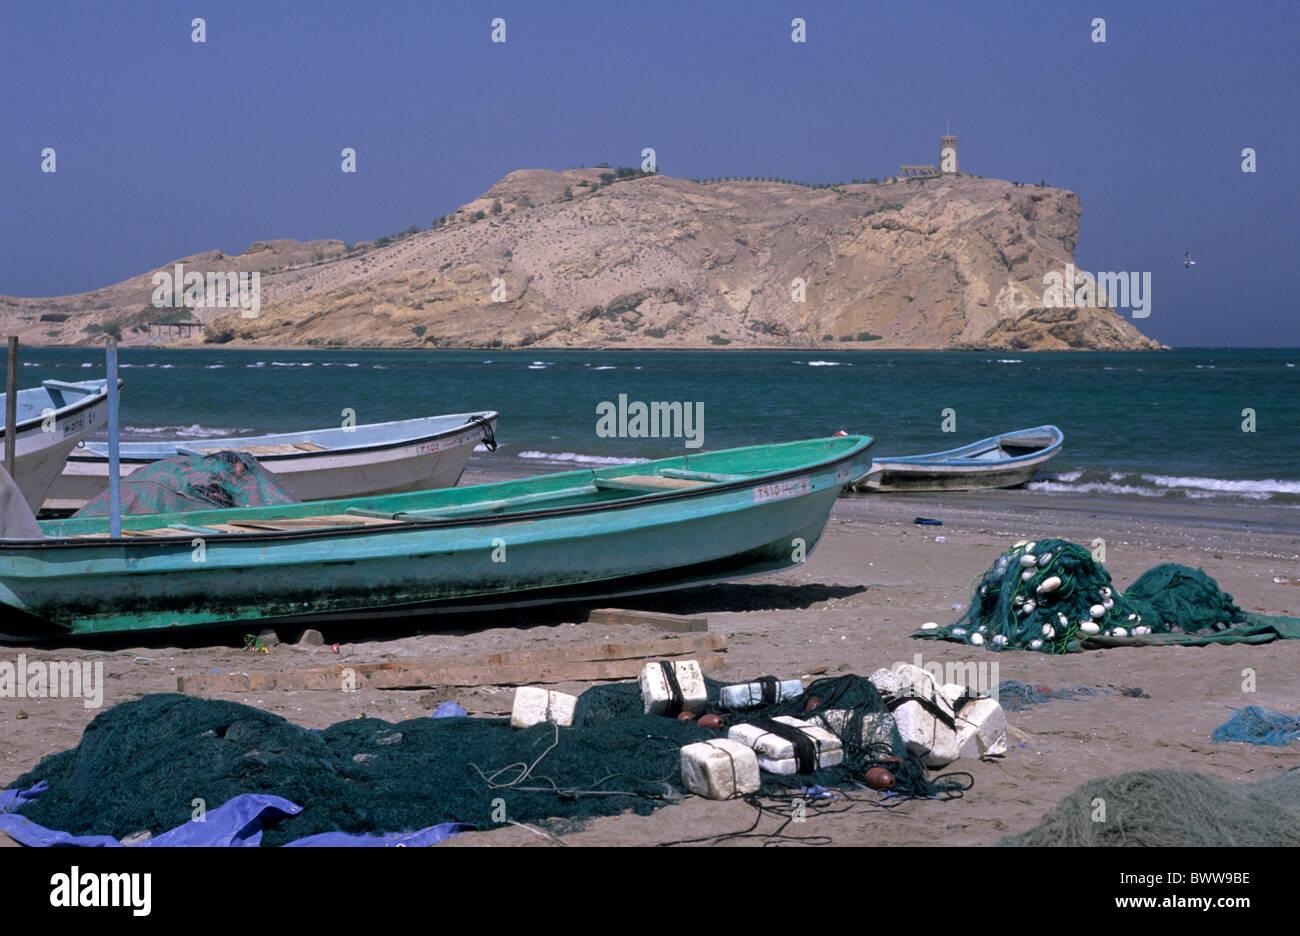 Oman middle East Al-Sawadi Beach fishing boats at Muscat coast beach sea ocean island watch tower nets RegStock Photo